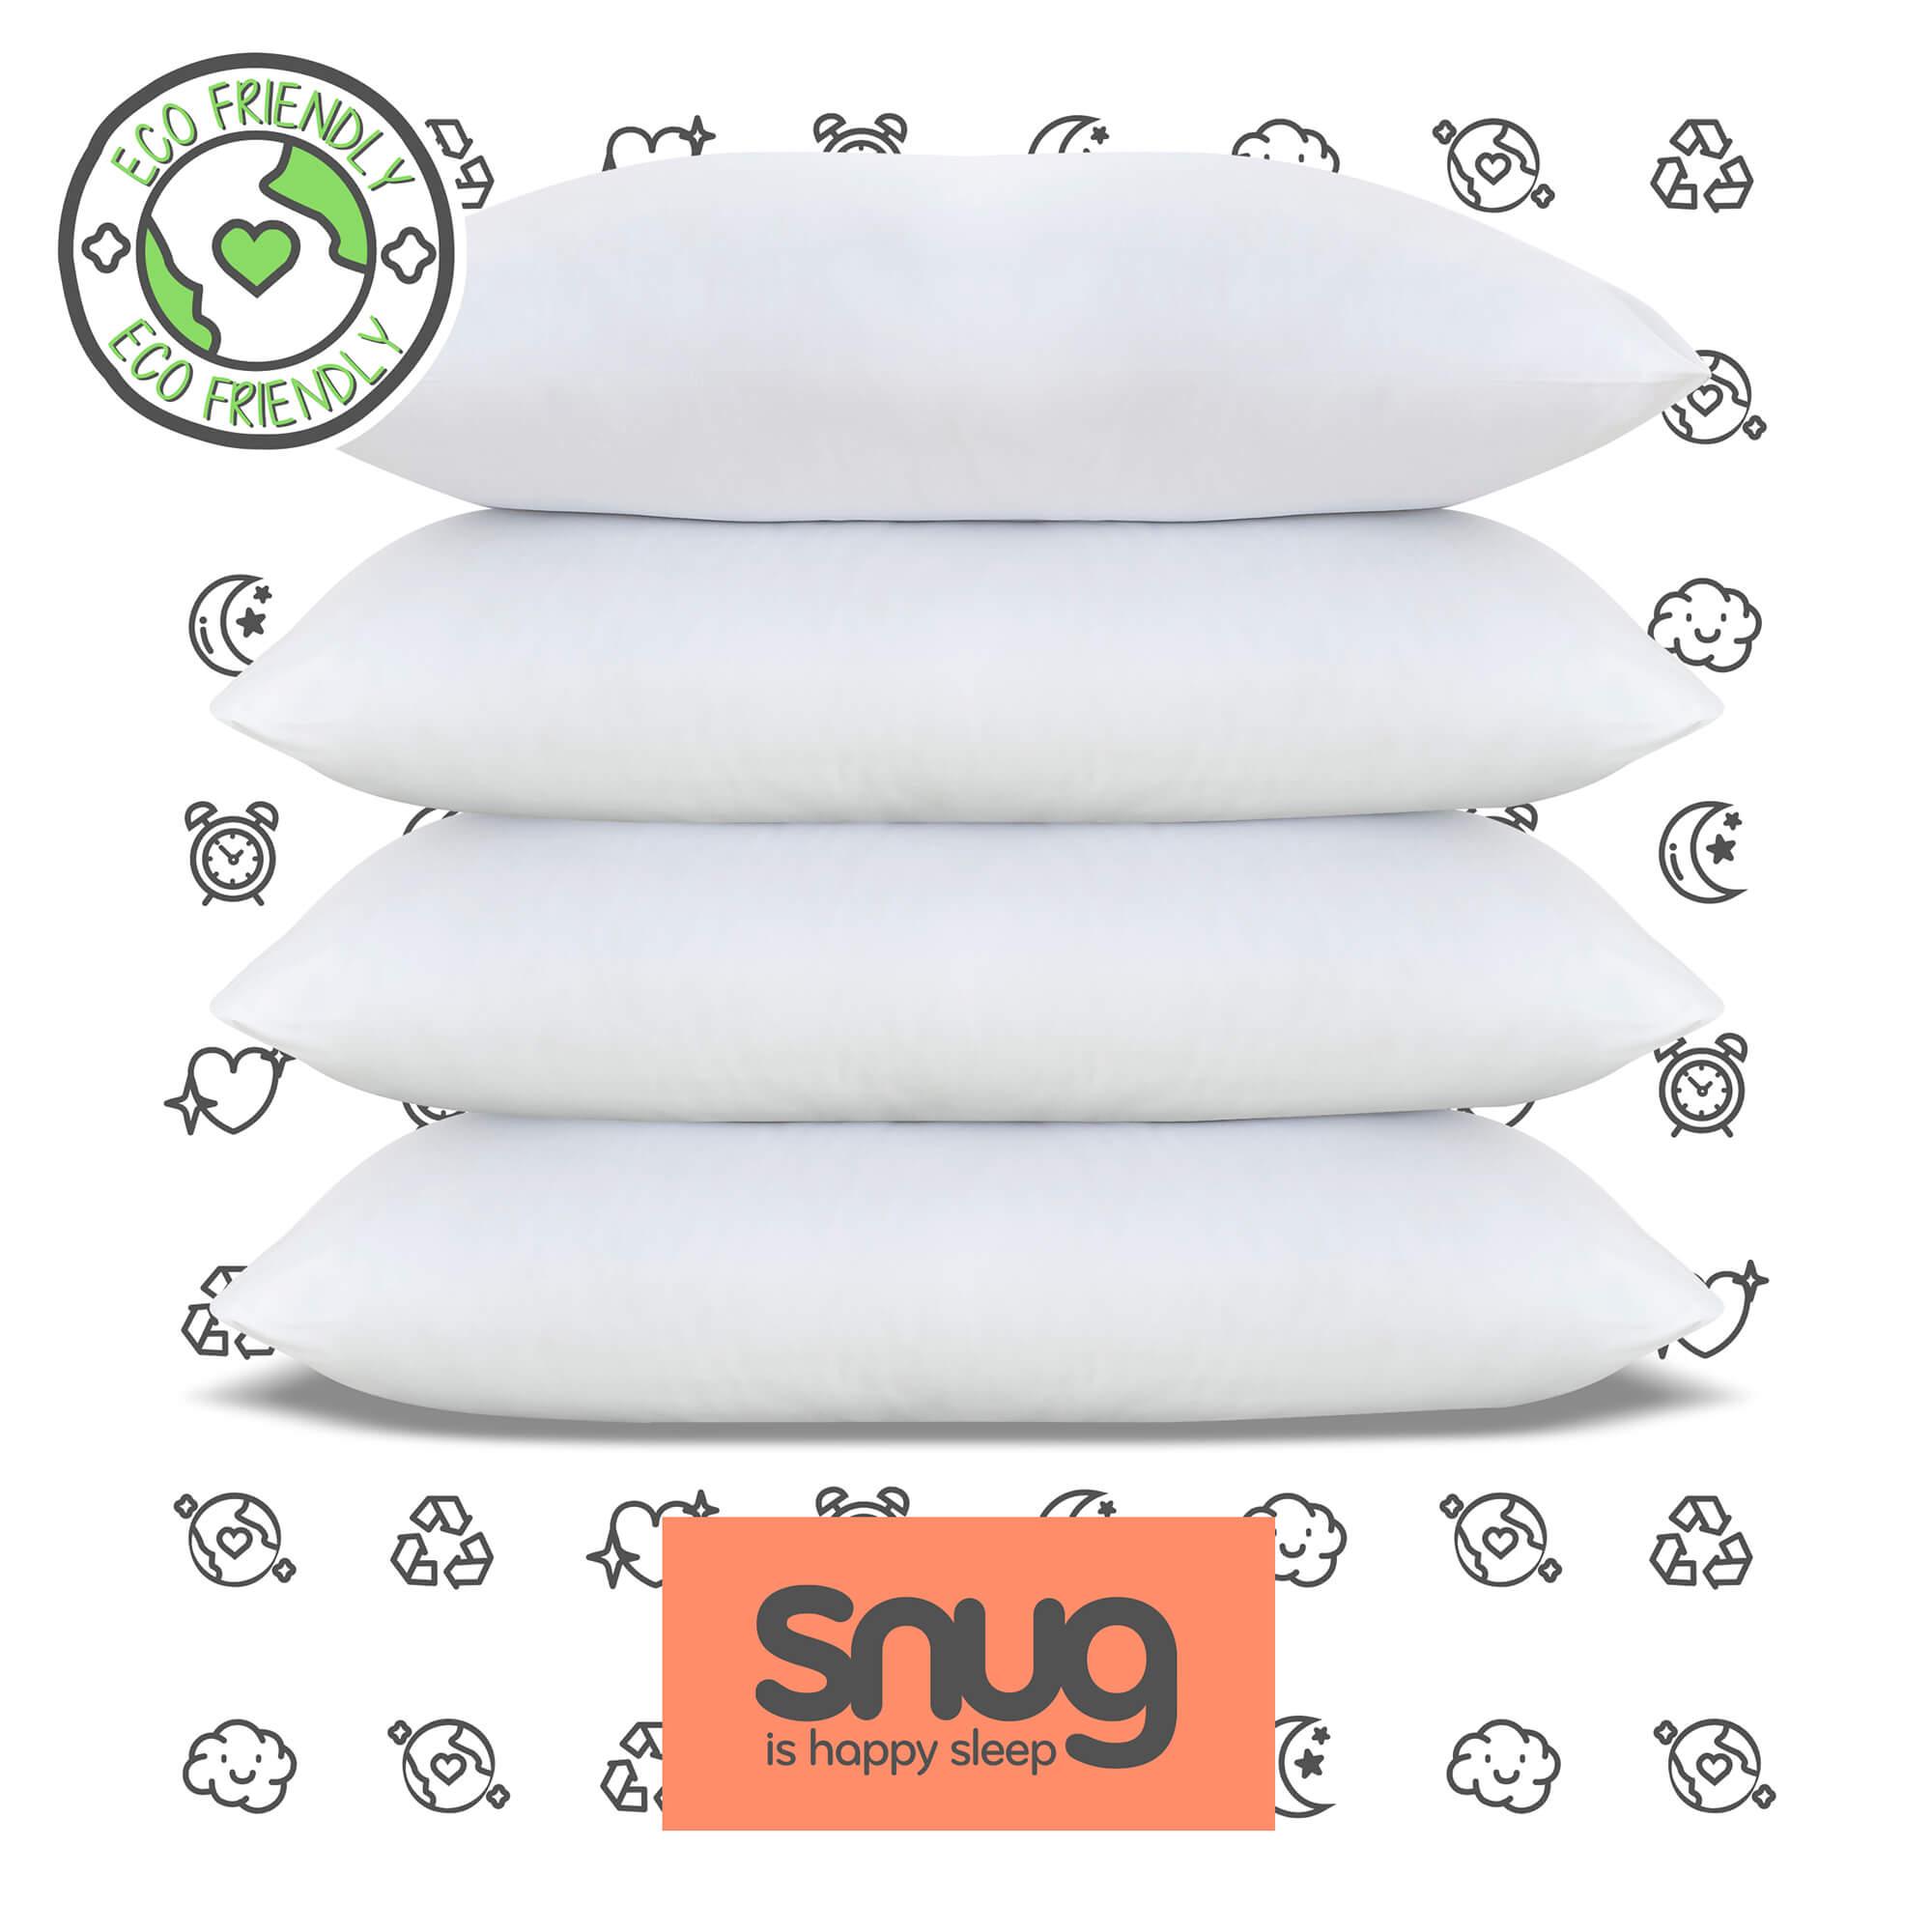 Snug Snuggle Up Pillows – 4 pack